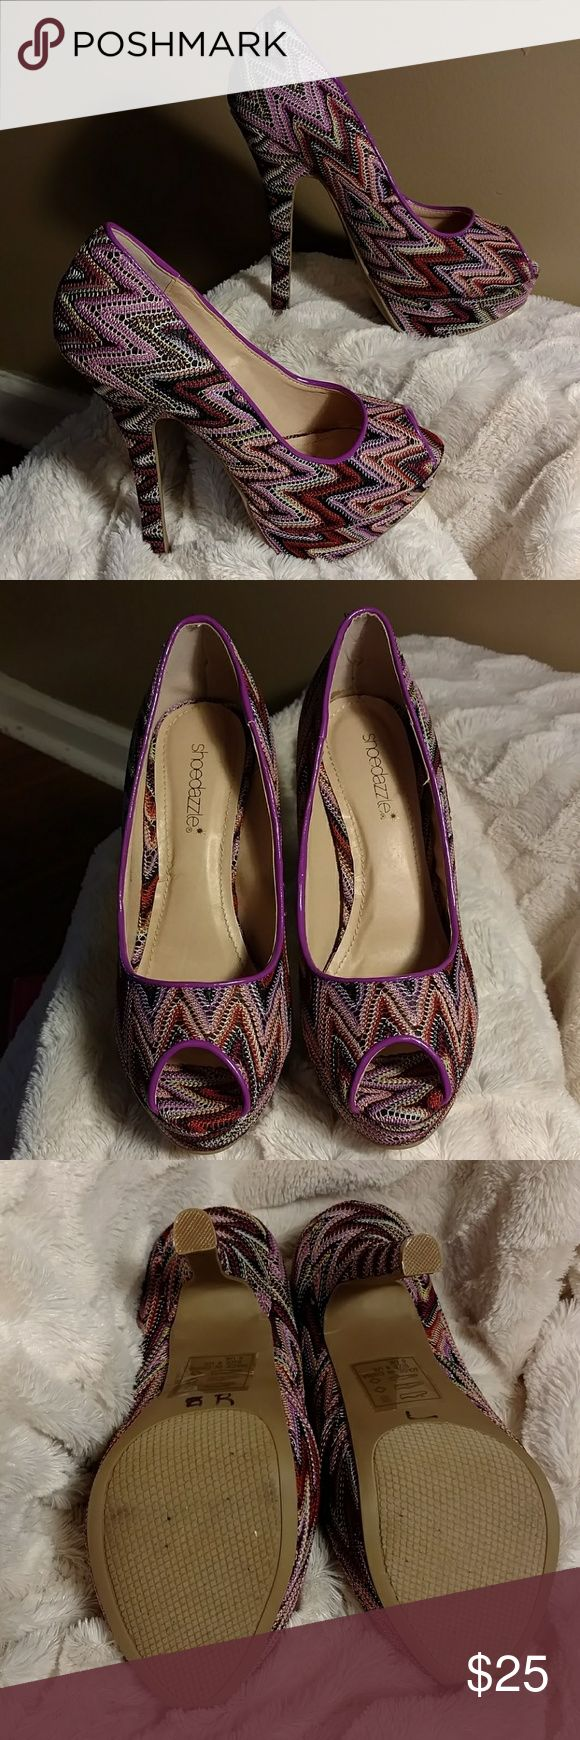 Women high heel shoes Sexy women multi color high heel shoes ShoeDazzle Shoes Heels